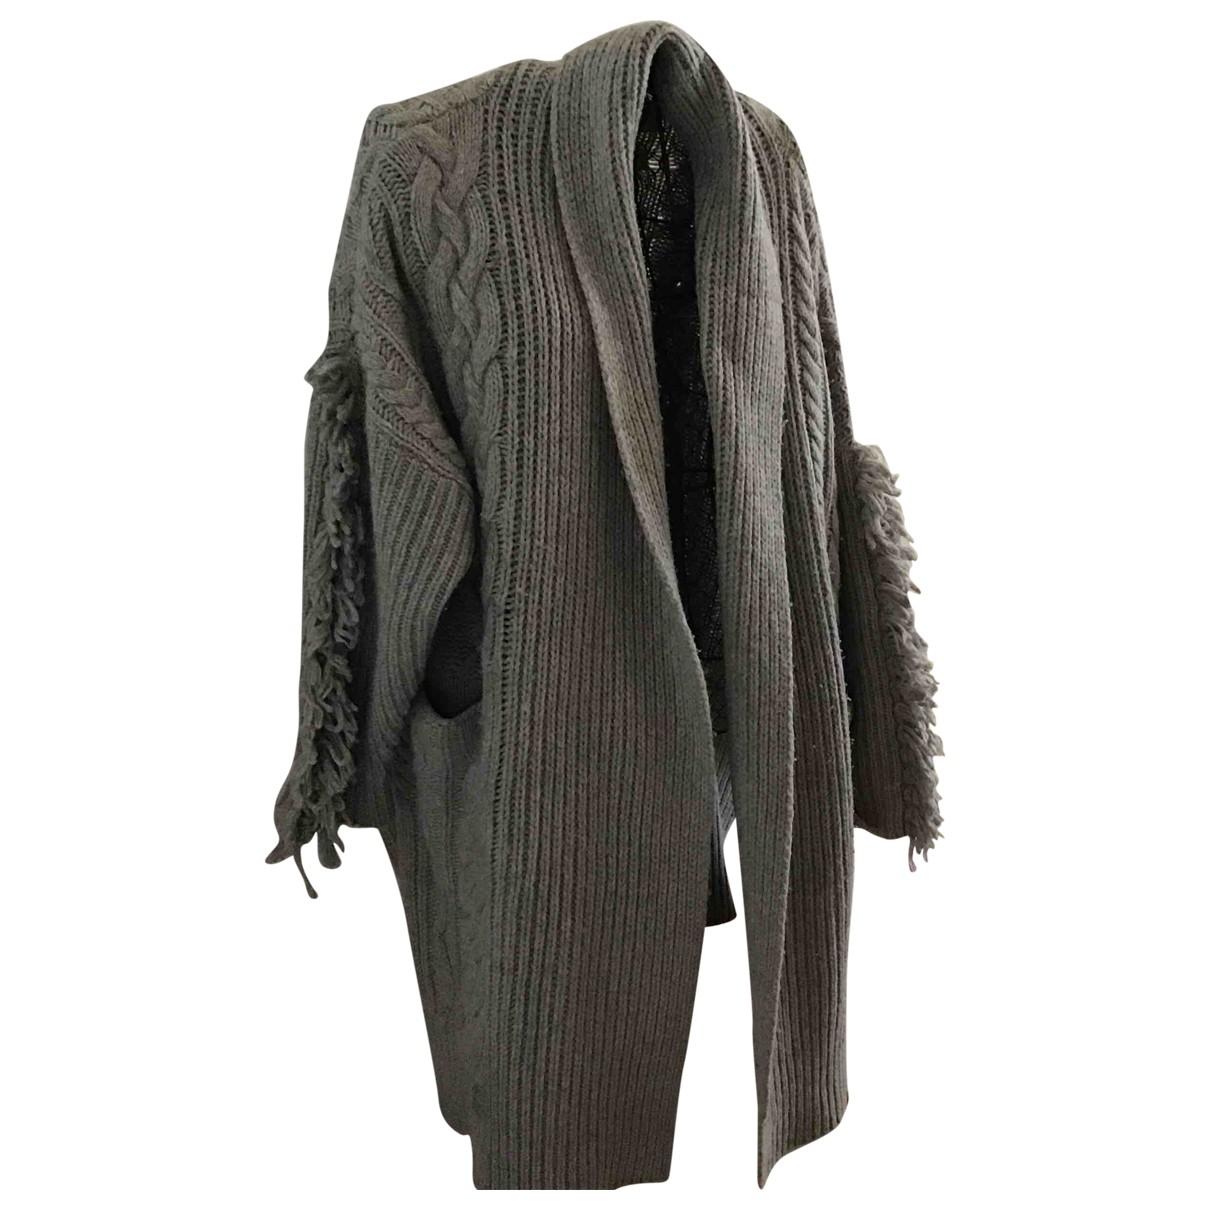 Zadig & Voltaire \N Grey Wool jacket for Women XS International